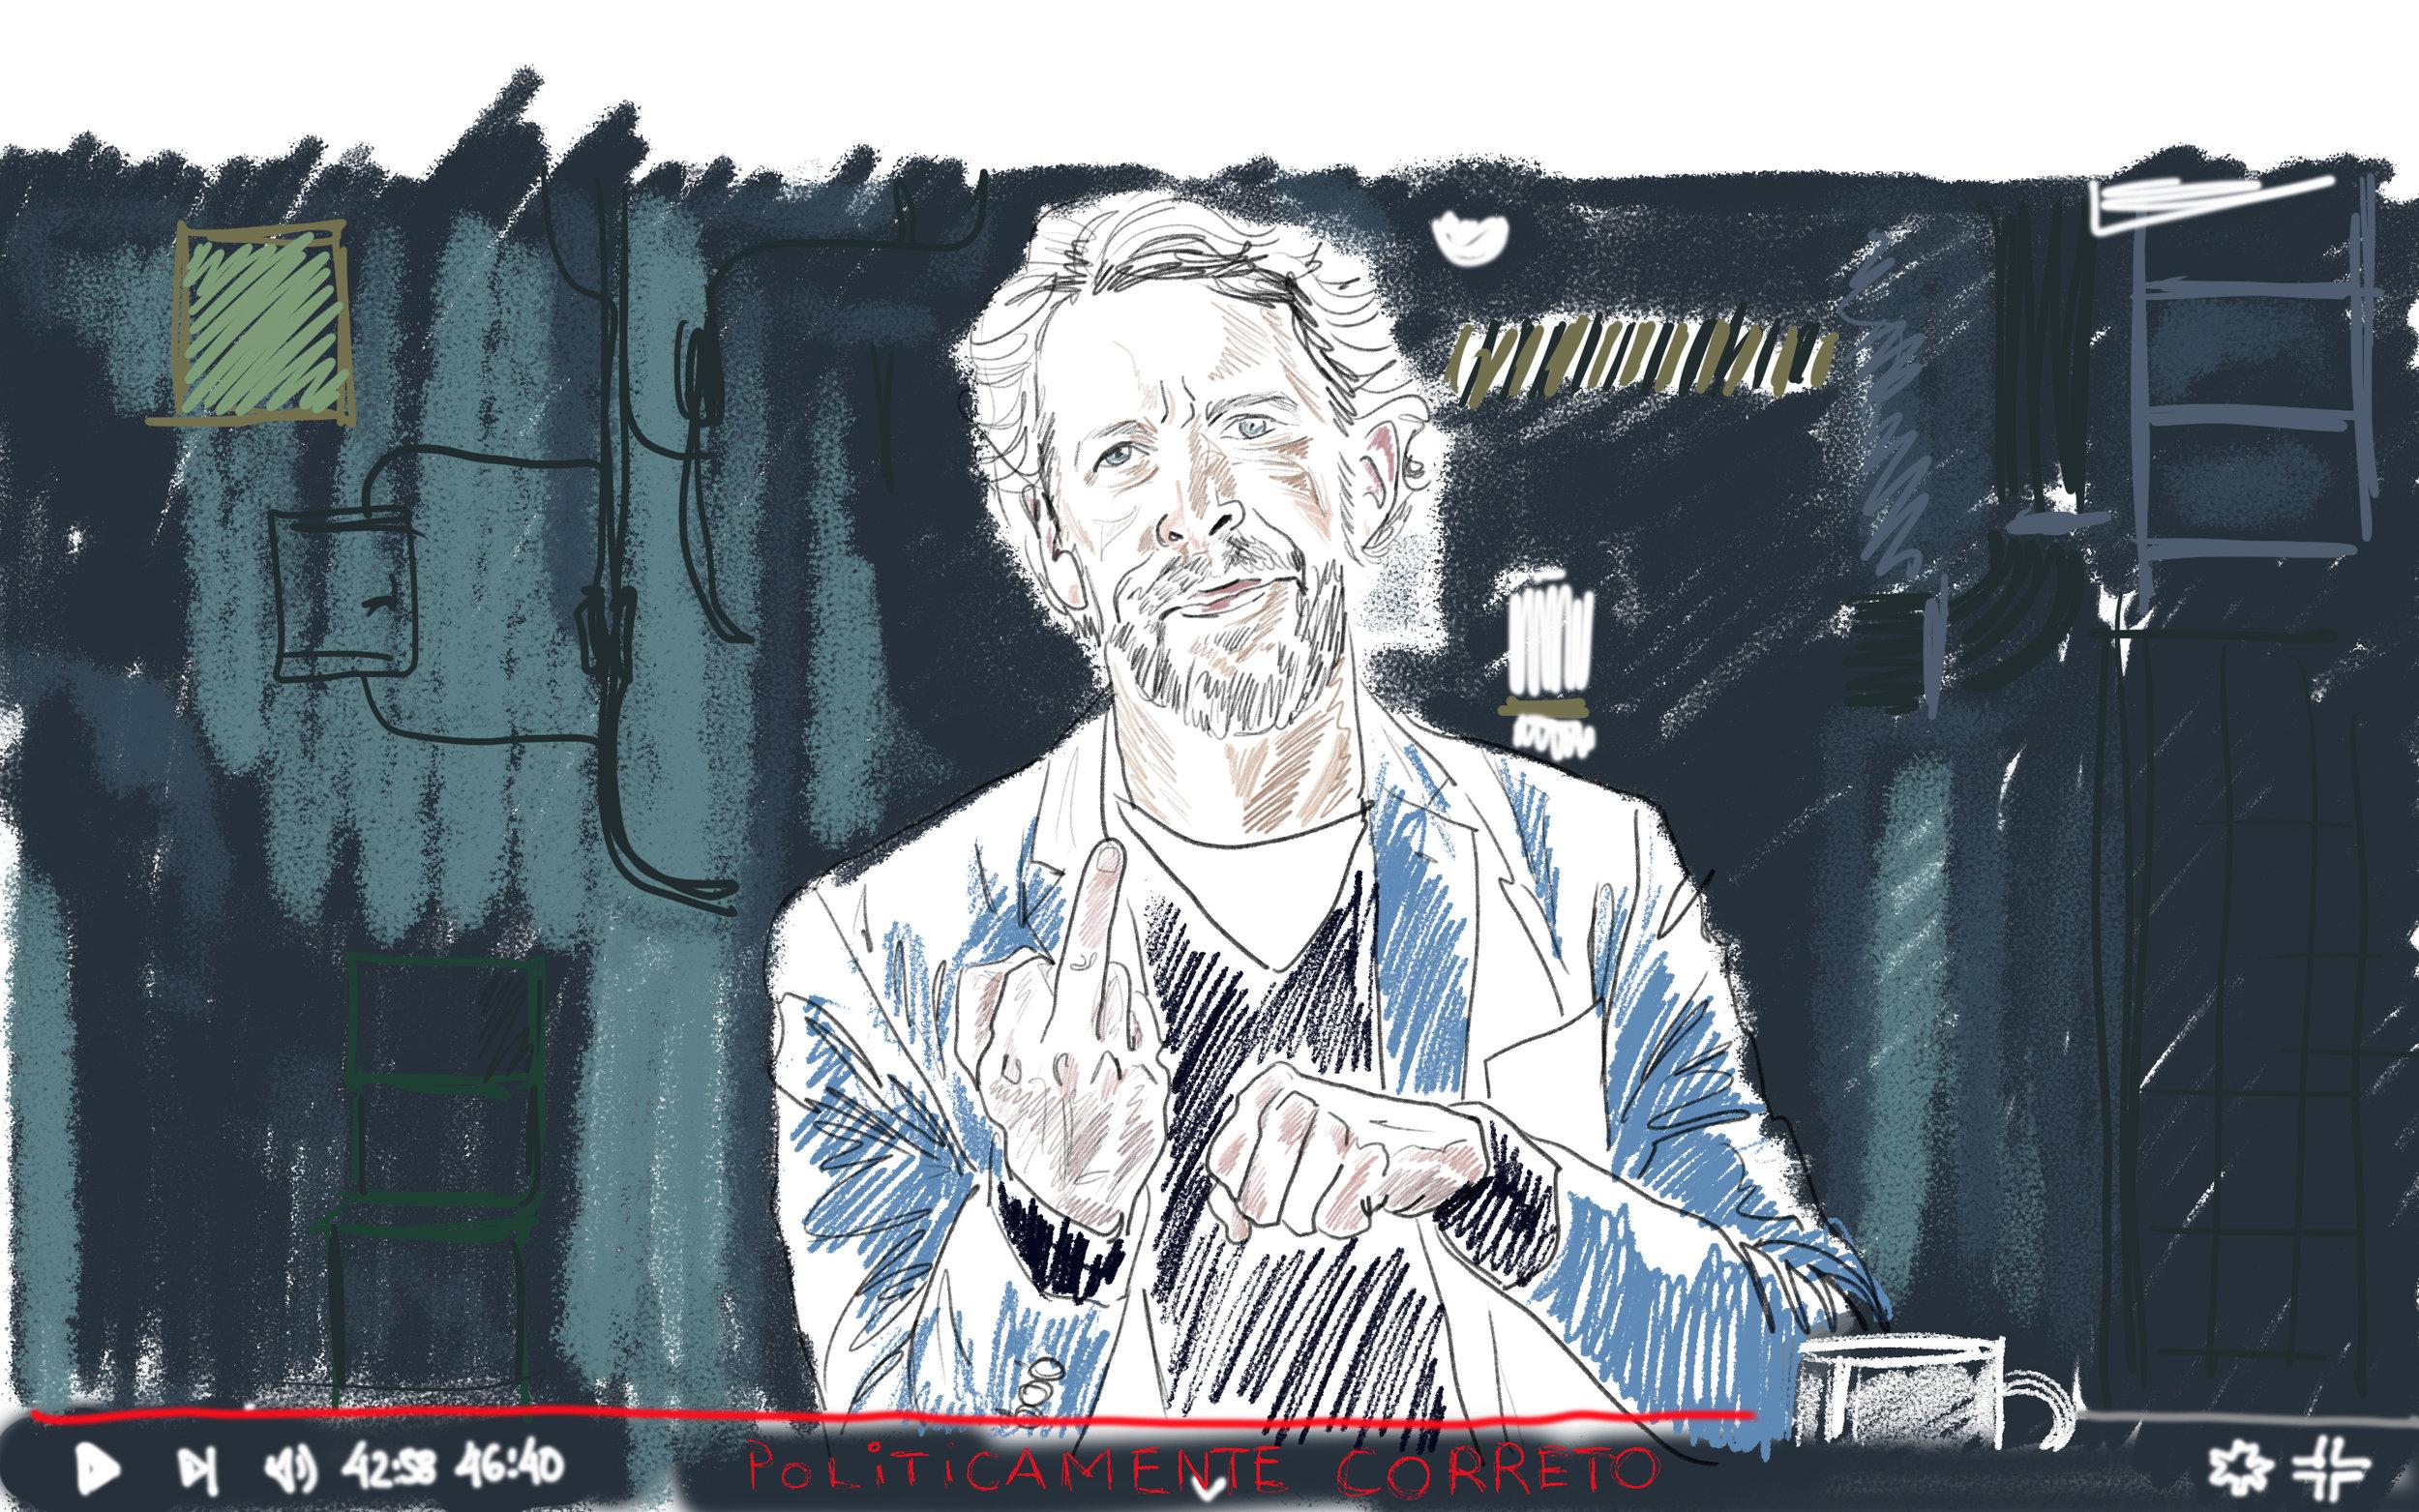 João Quadros, humorist and screenwriter, on his web show Politicamente Correto